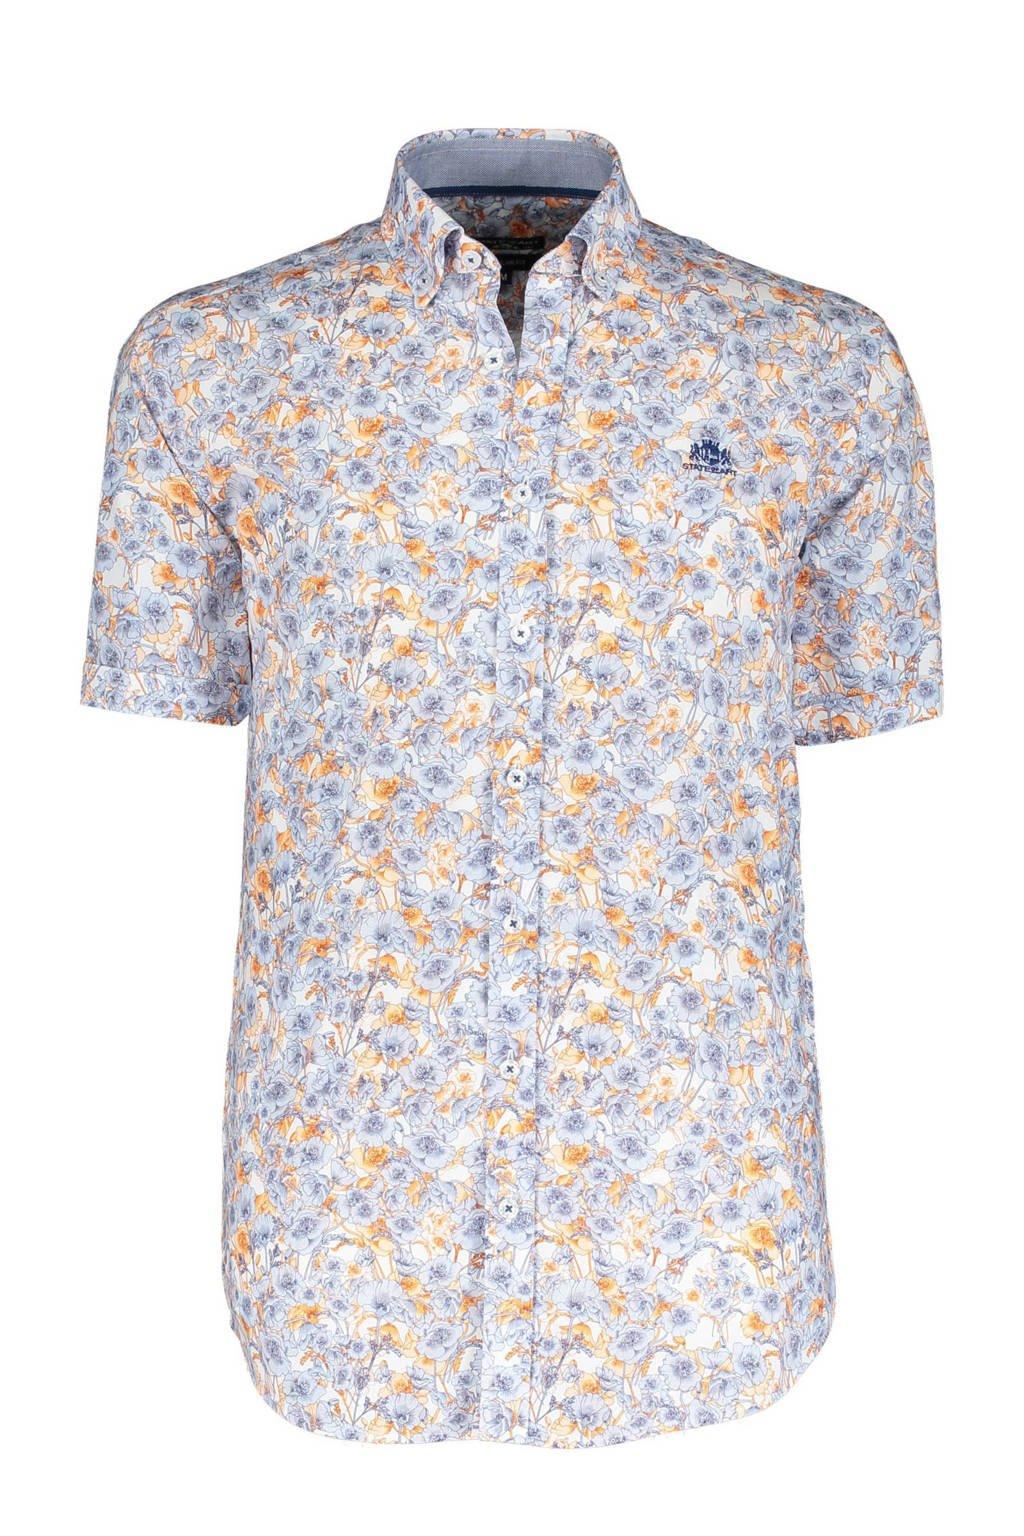 State of Art gebloemd regular fit overhemd oranje/lichtblauw, Oranje/lichtblauw